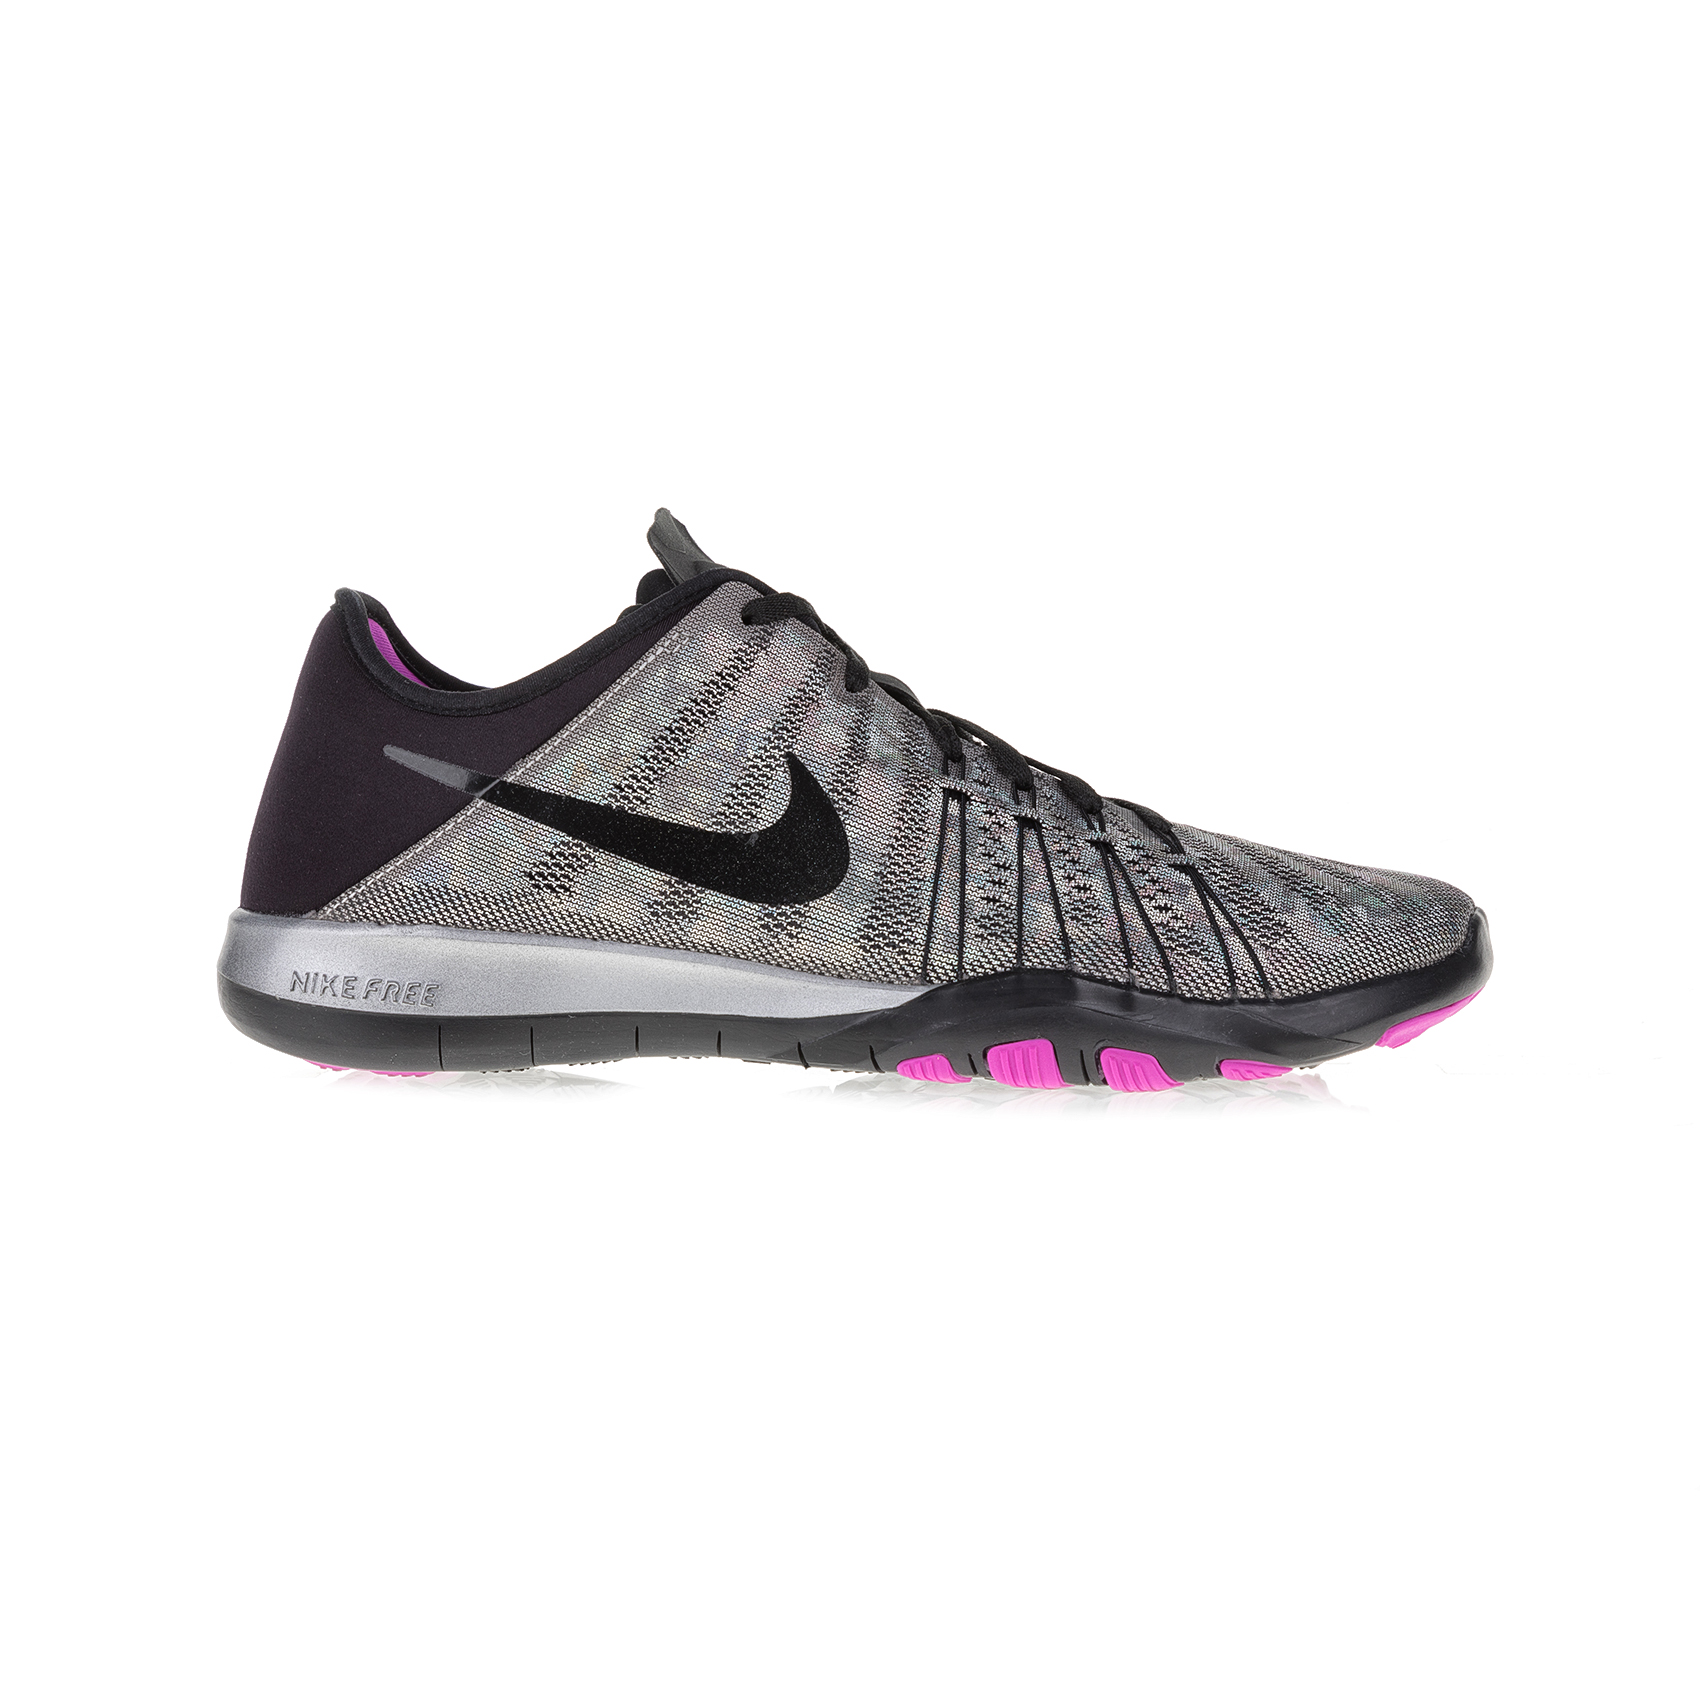 NIKE - Γυναικεία αθλητικά παπούτσια NIKE FREE TR 6 MTLC γκρι-μοβ